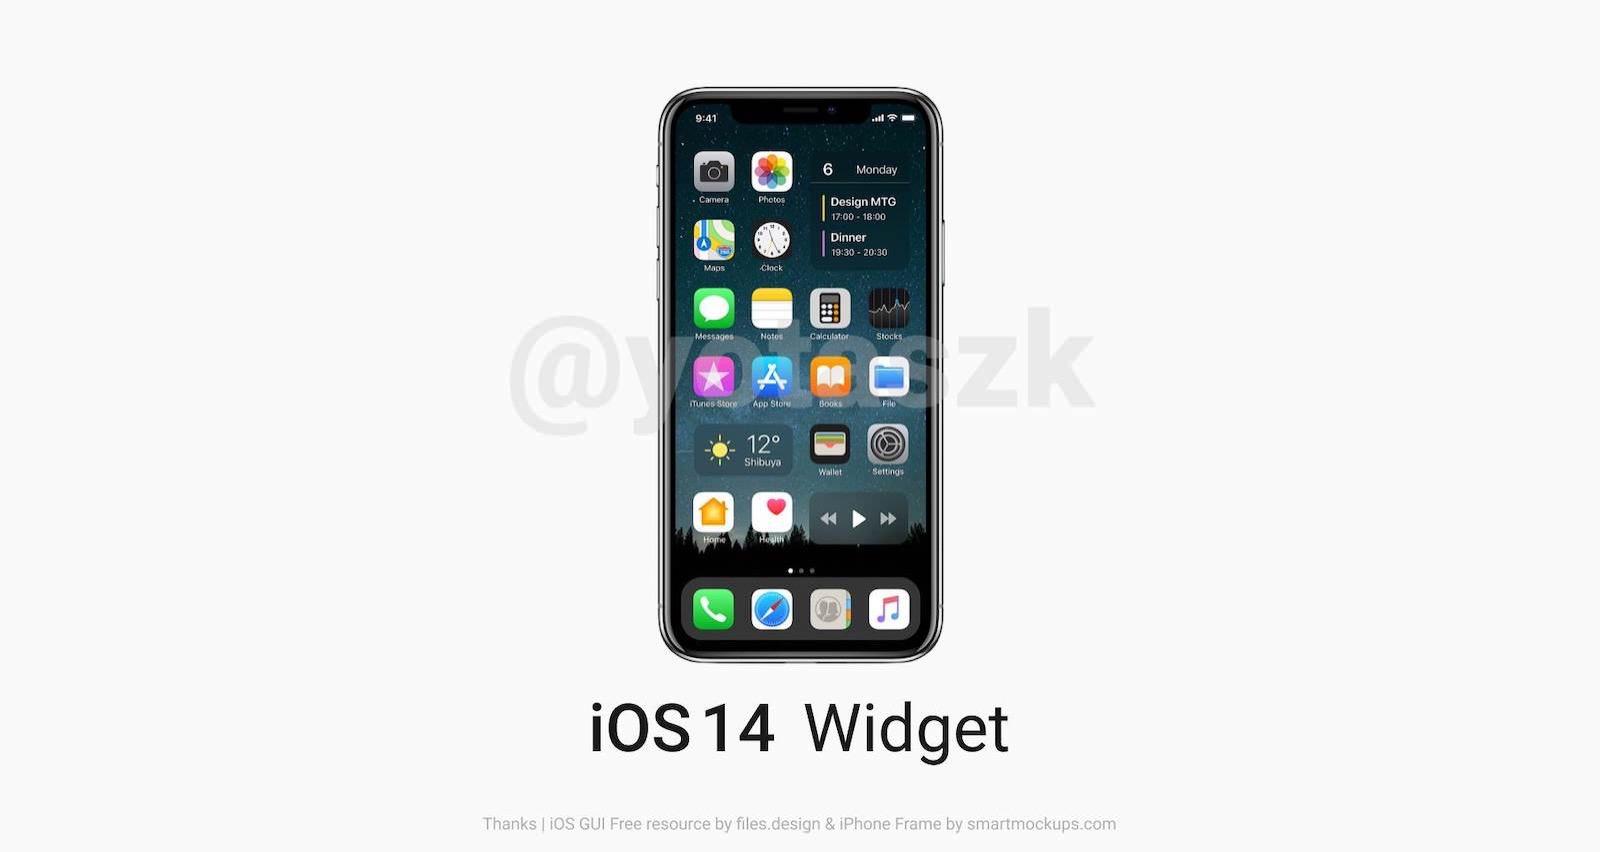 IOS14 widget concept image by yotasuzuki final